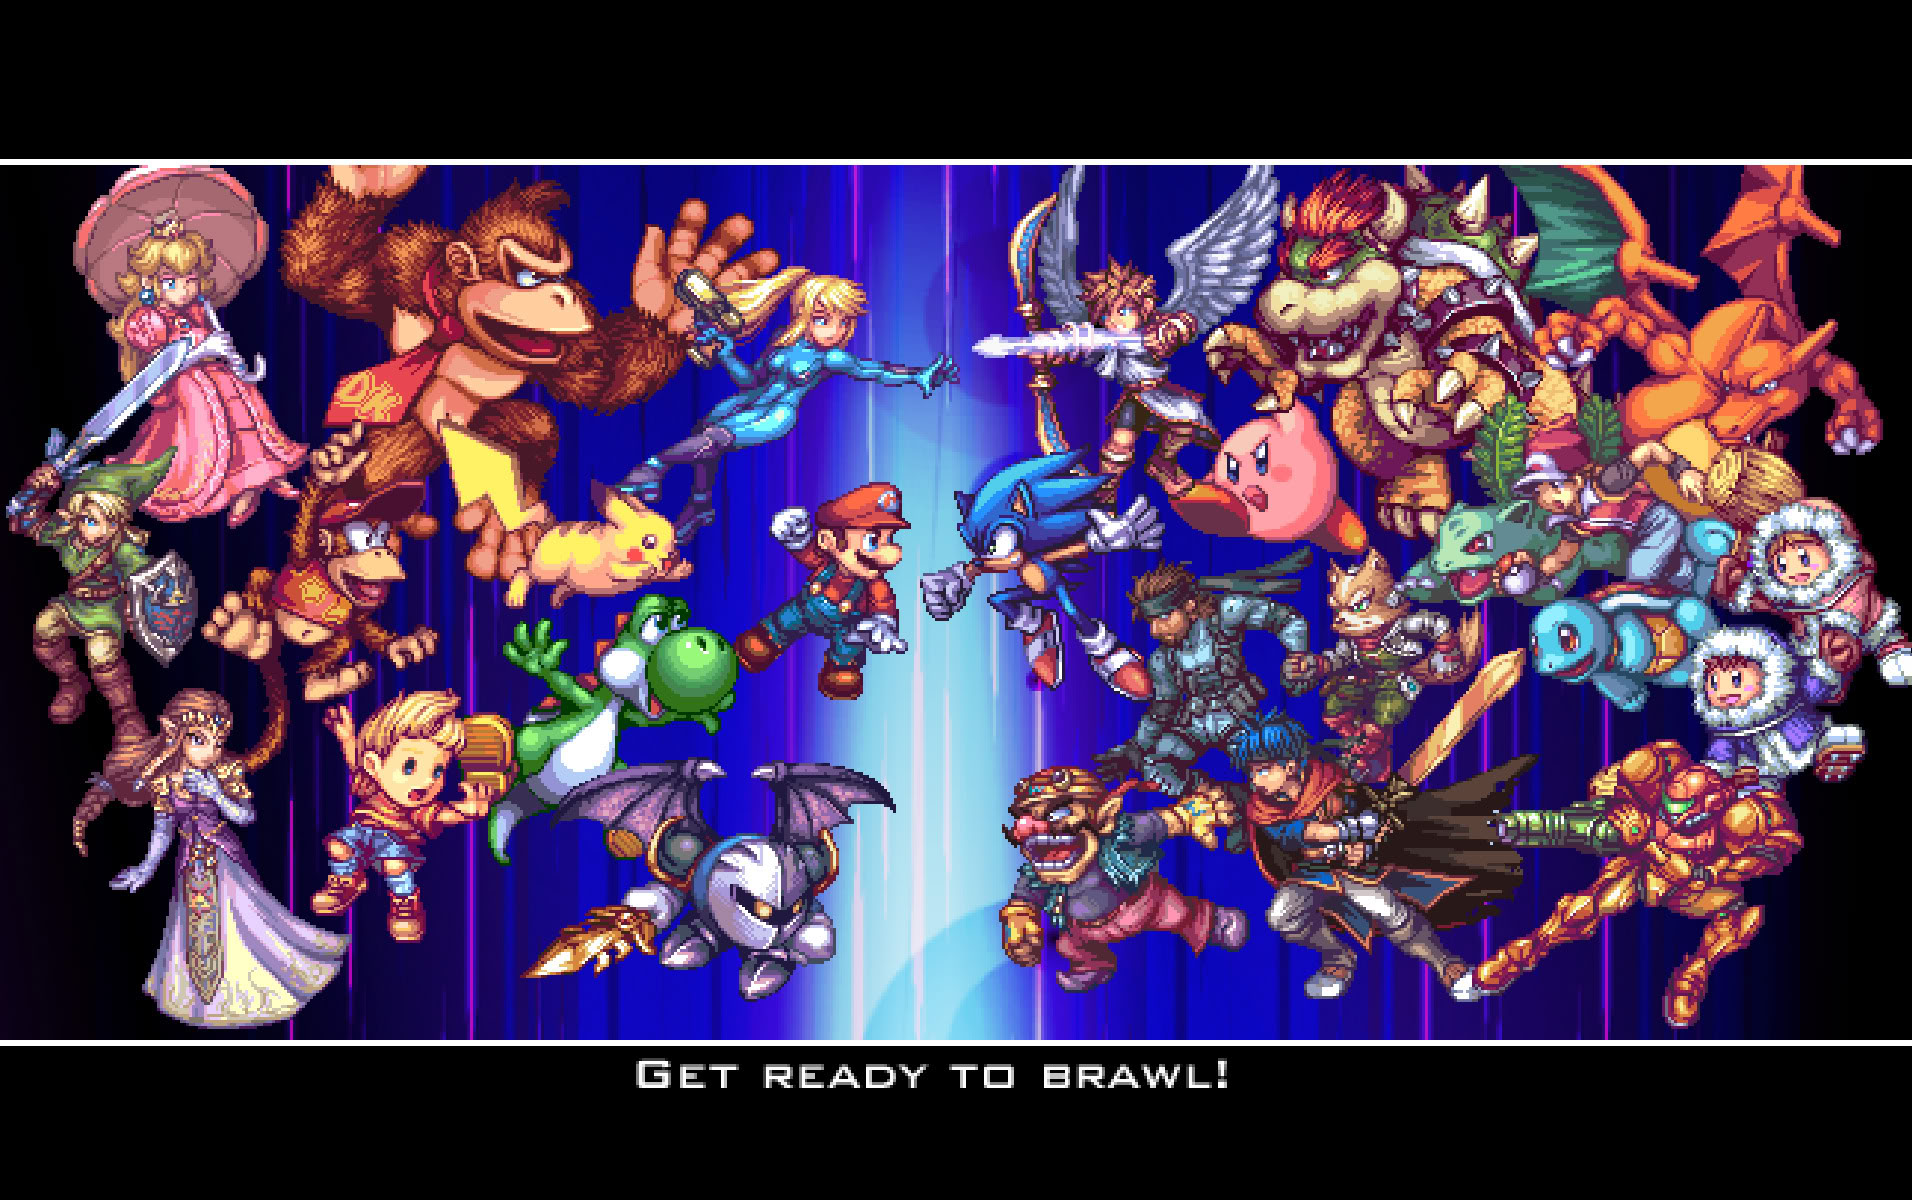 Super Smash Bros Brawl Wallpaper